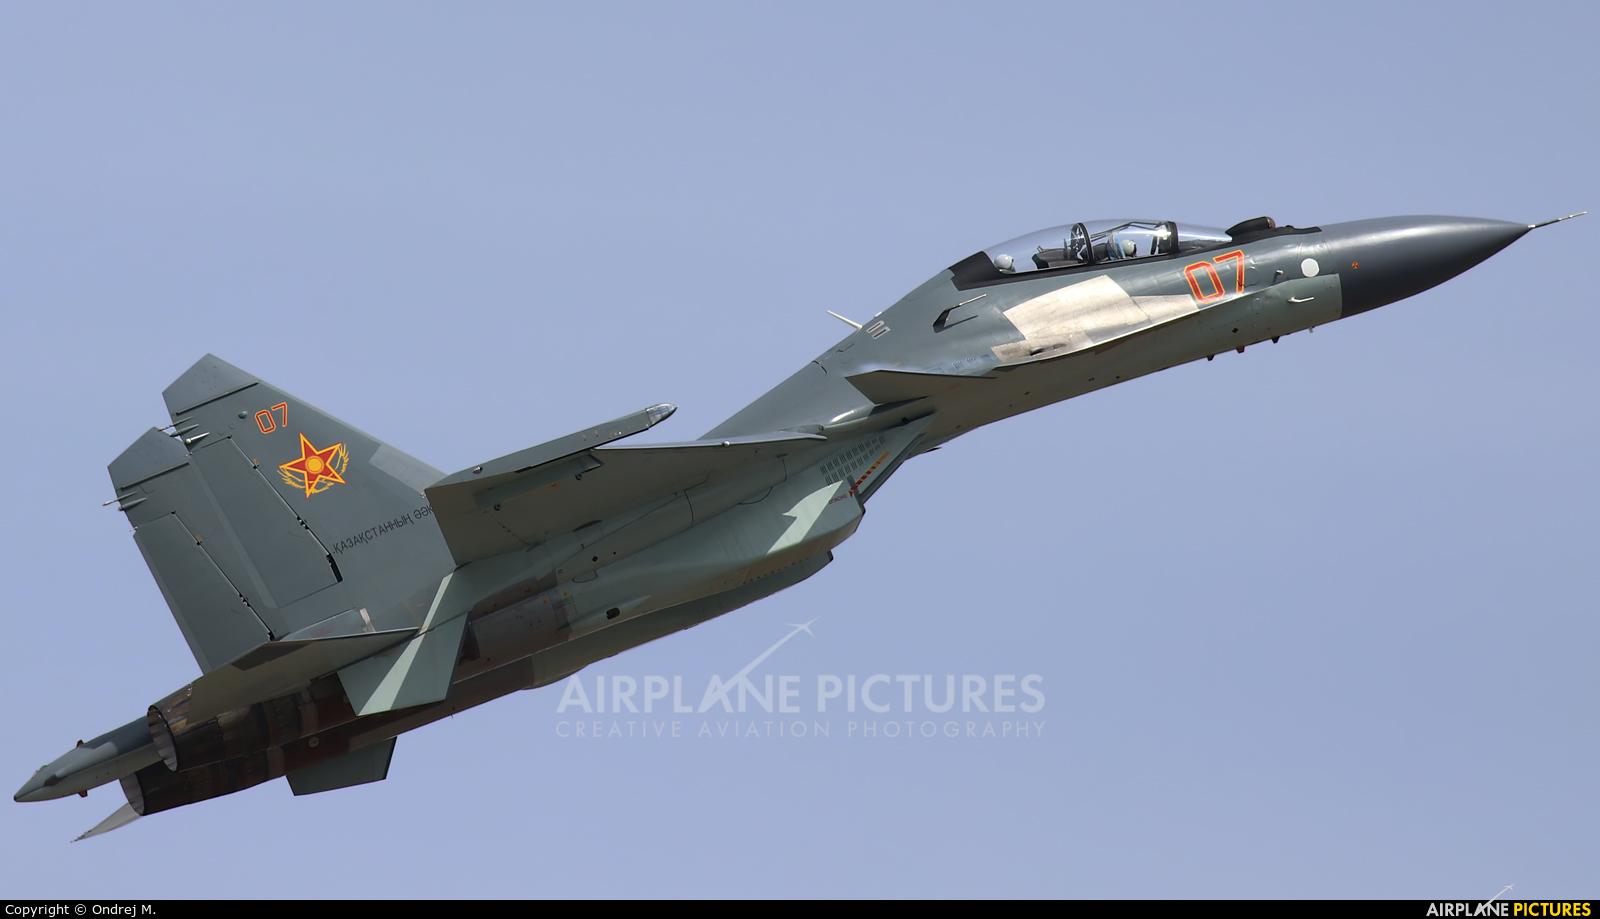 Kazakhstan - Air Force 07 aircraft at Astana